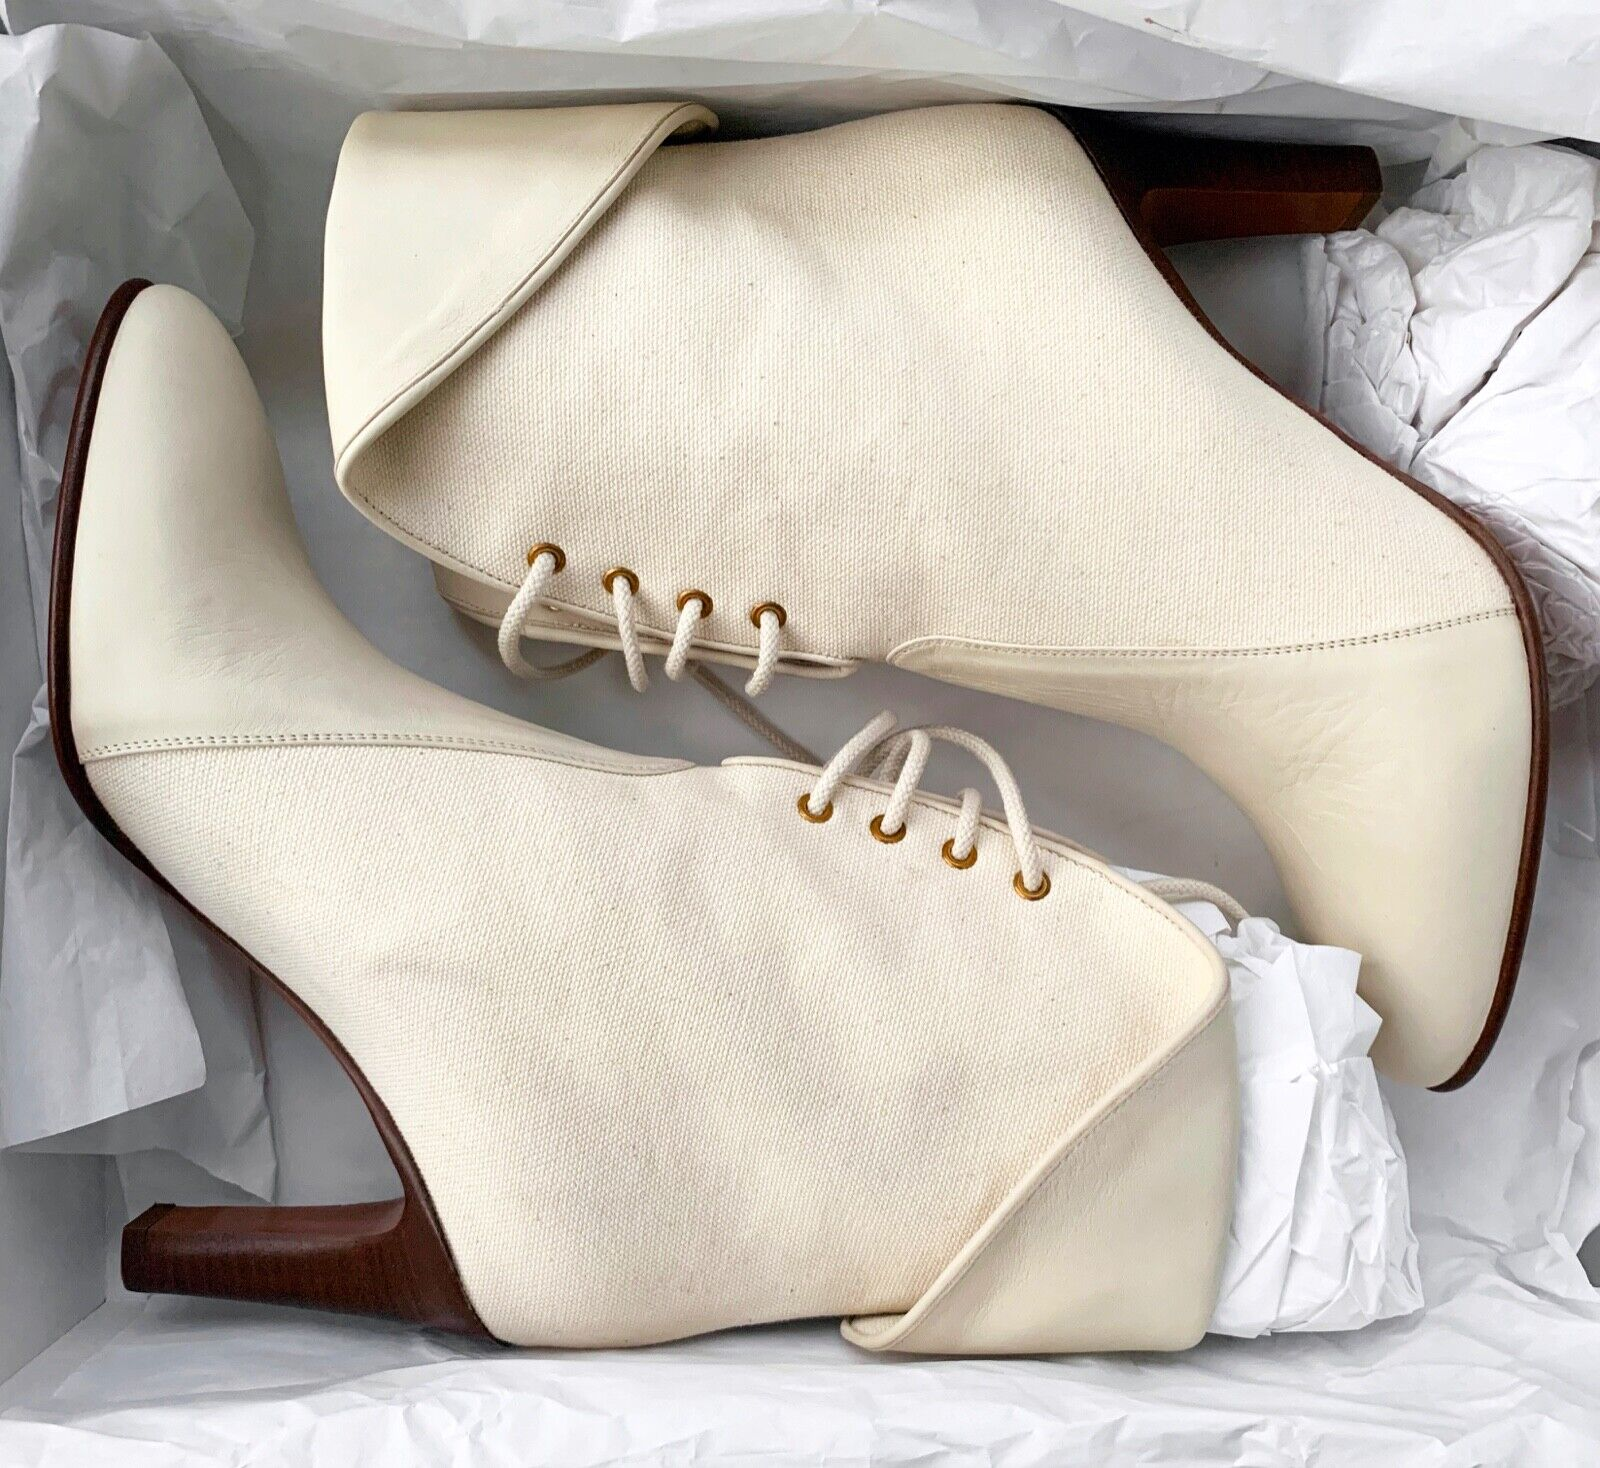 895 Chloe Kole Leather Canvas Fold Over Lace Up Ankle Boots Ecru Ivory 375